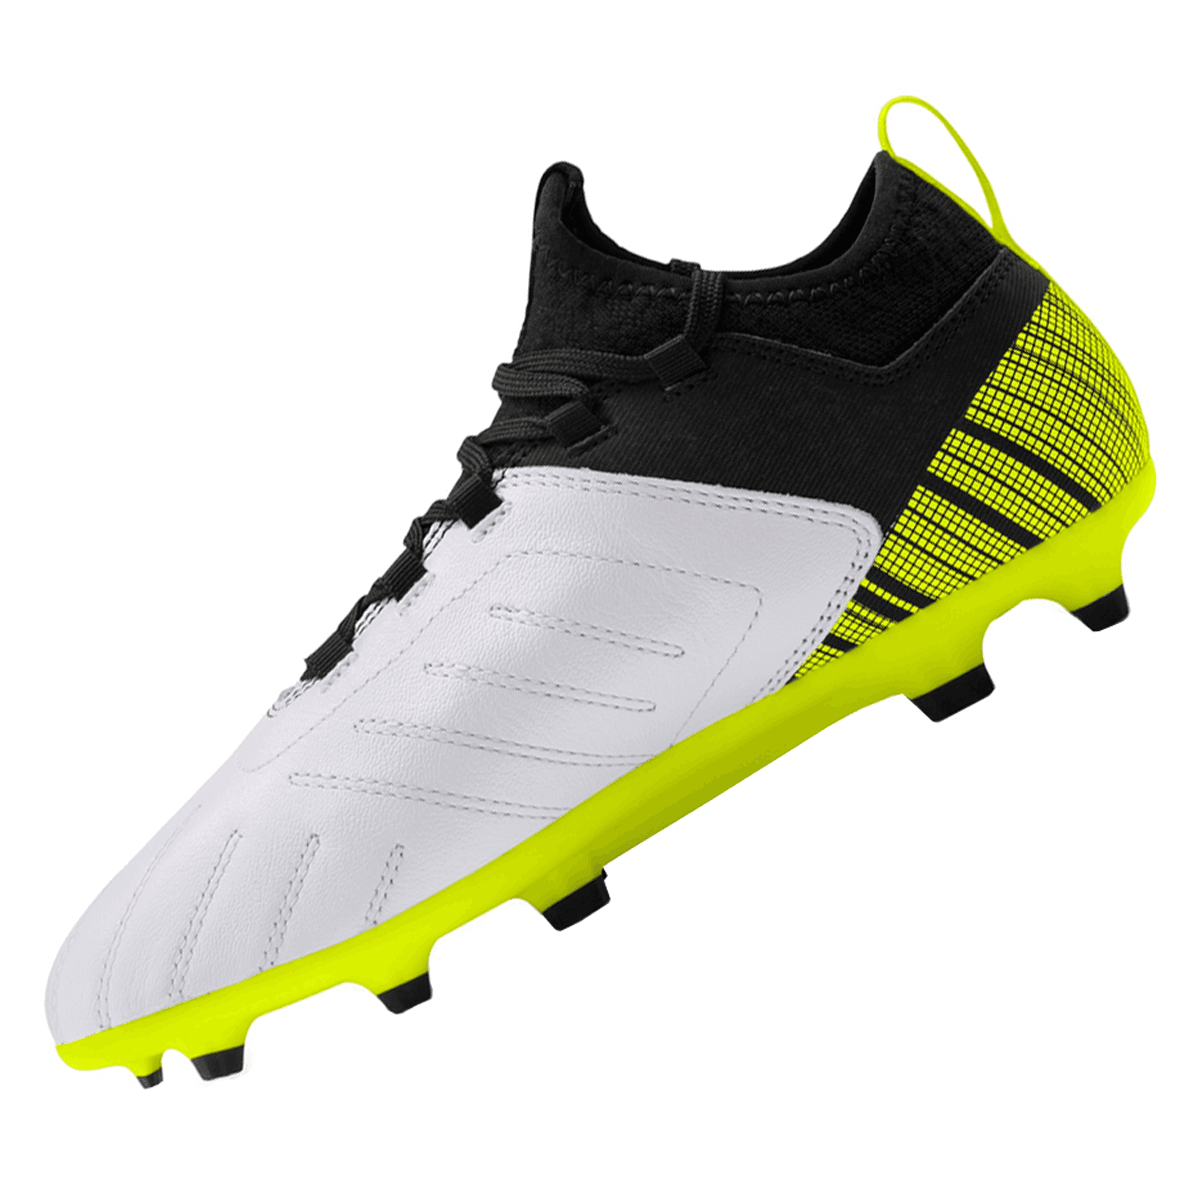 Puma kinderen voetbalschoenen One 5.3 FGAG Jr. geel fluozwart